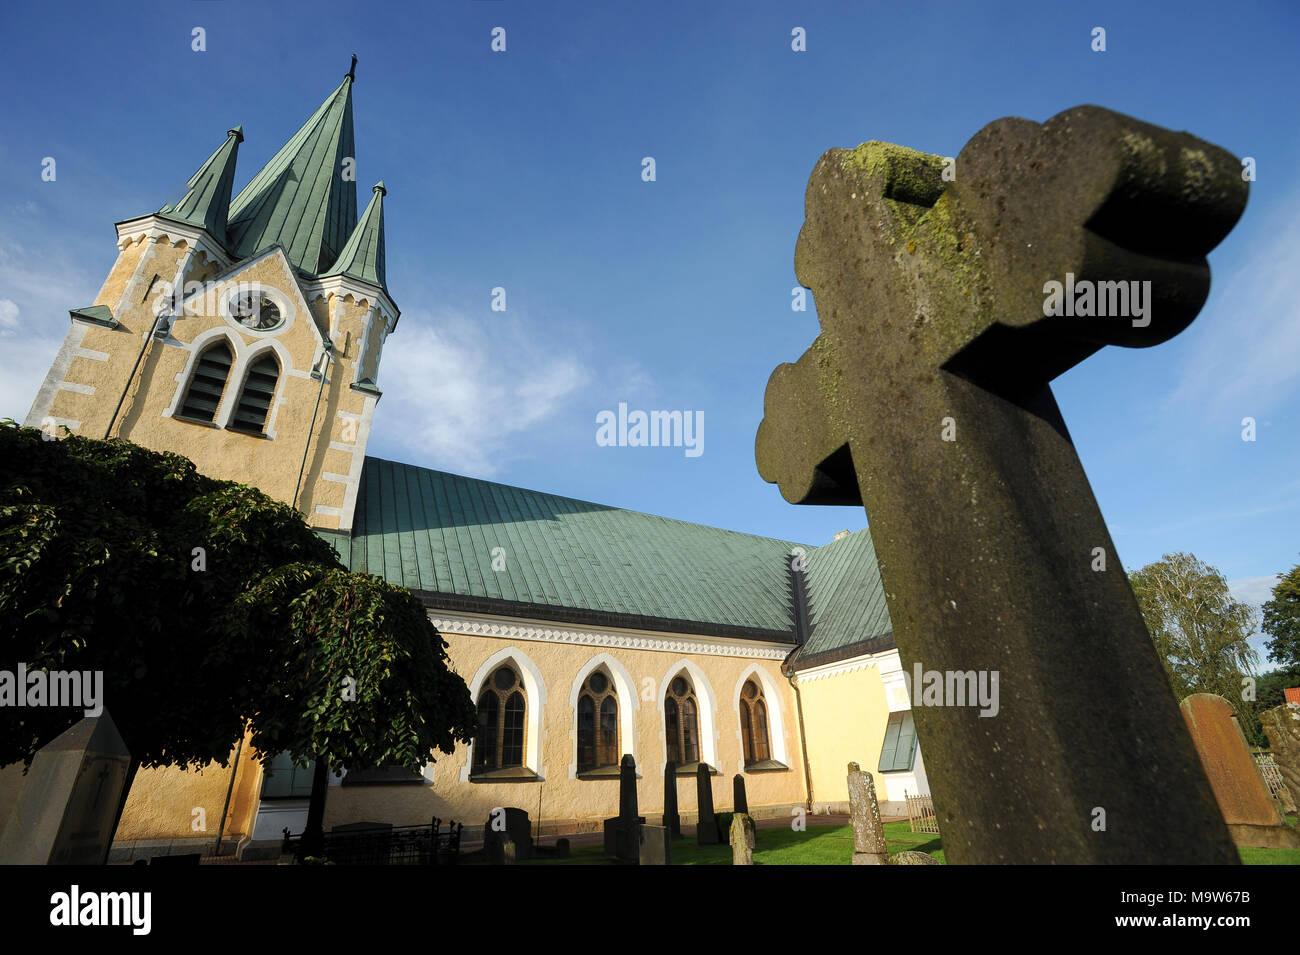 stra Hoby Church - Wikipedia